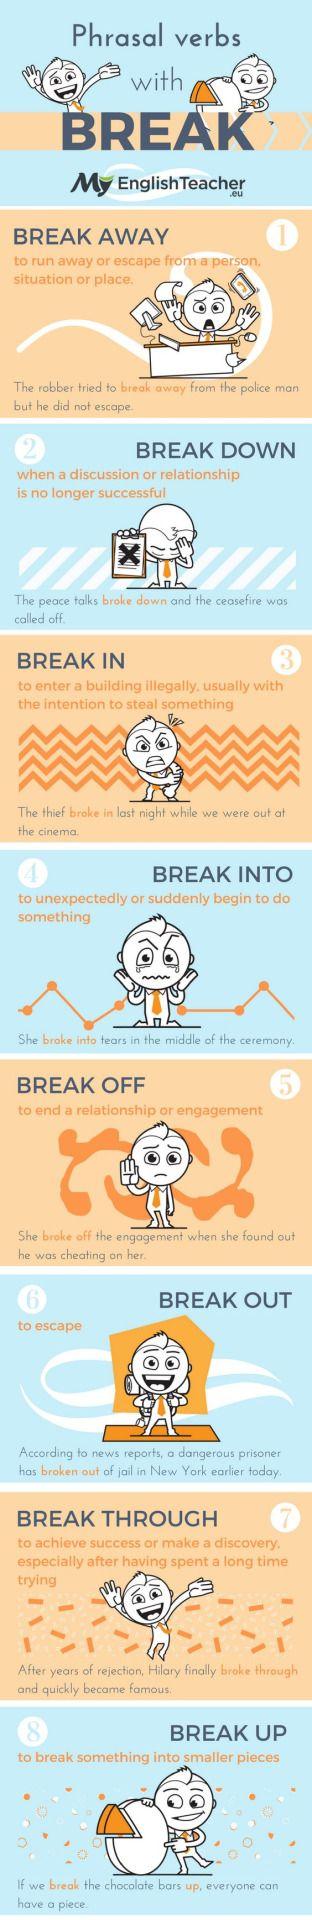 Phrasal verbs with BREAK #learnenglish